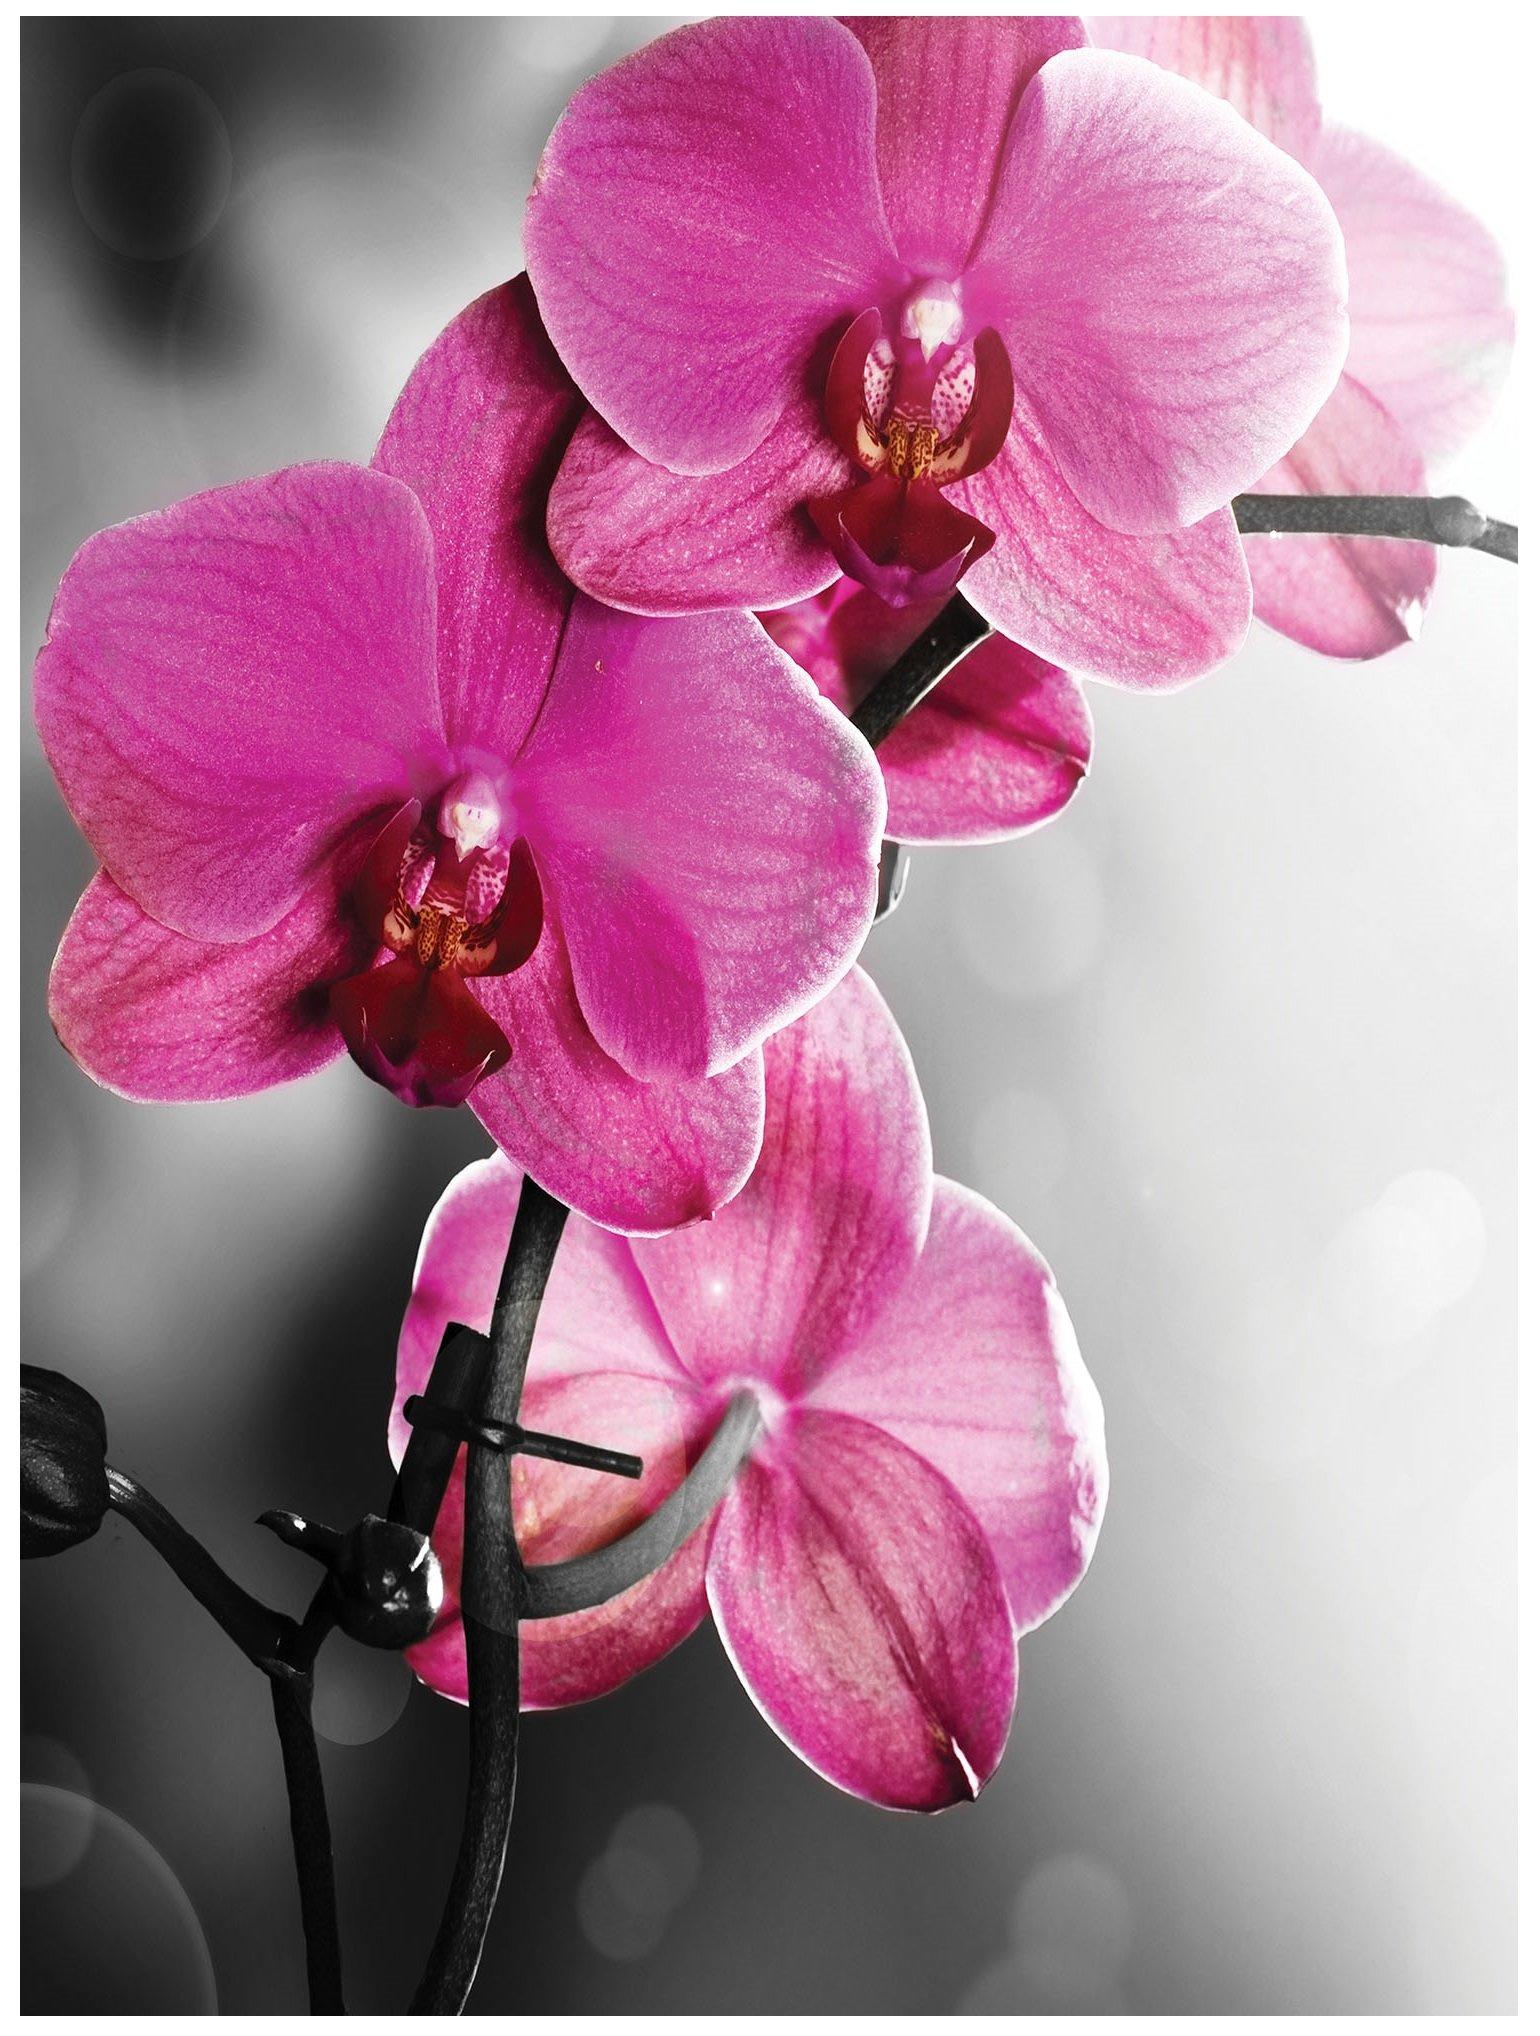 Fototapeta kwiaty kwiat liście fototapety